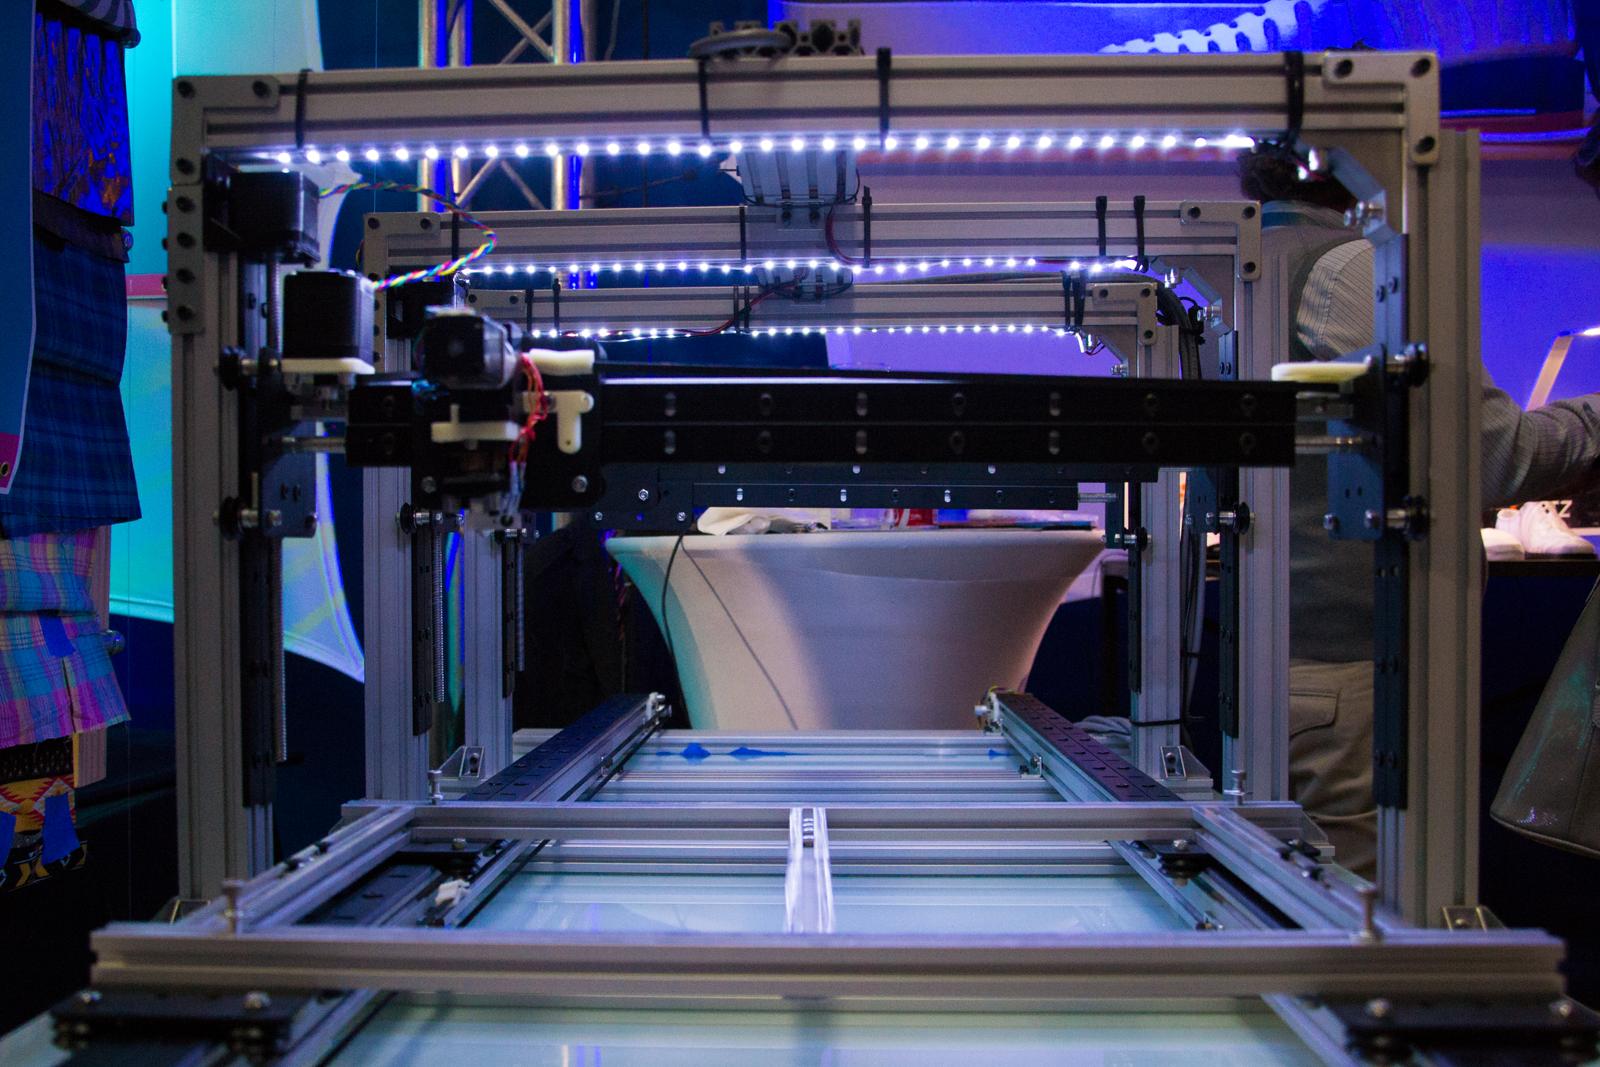 Feetz 3d printed shoes begins pre order 3d printing industry 3d printing process